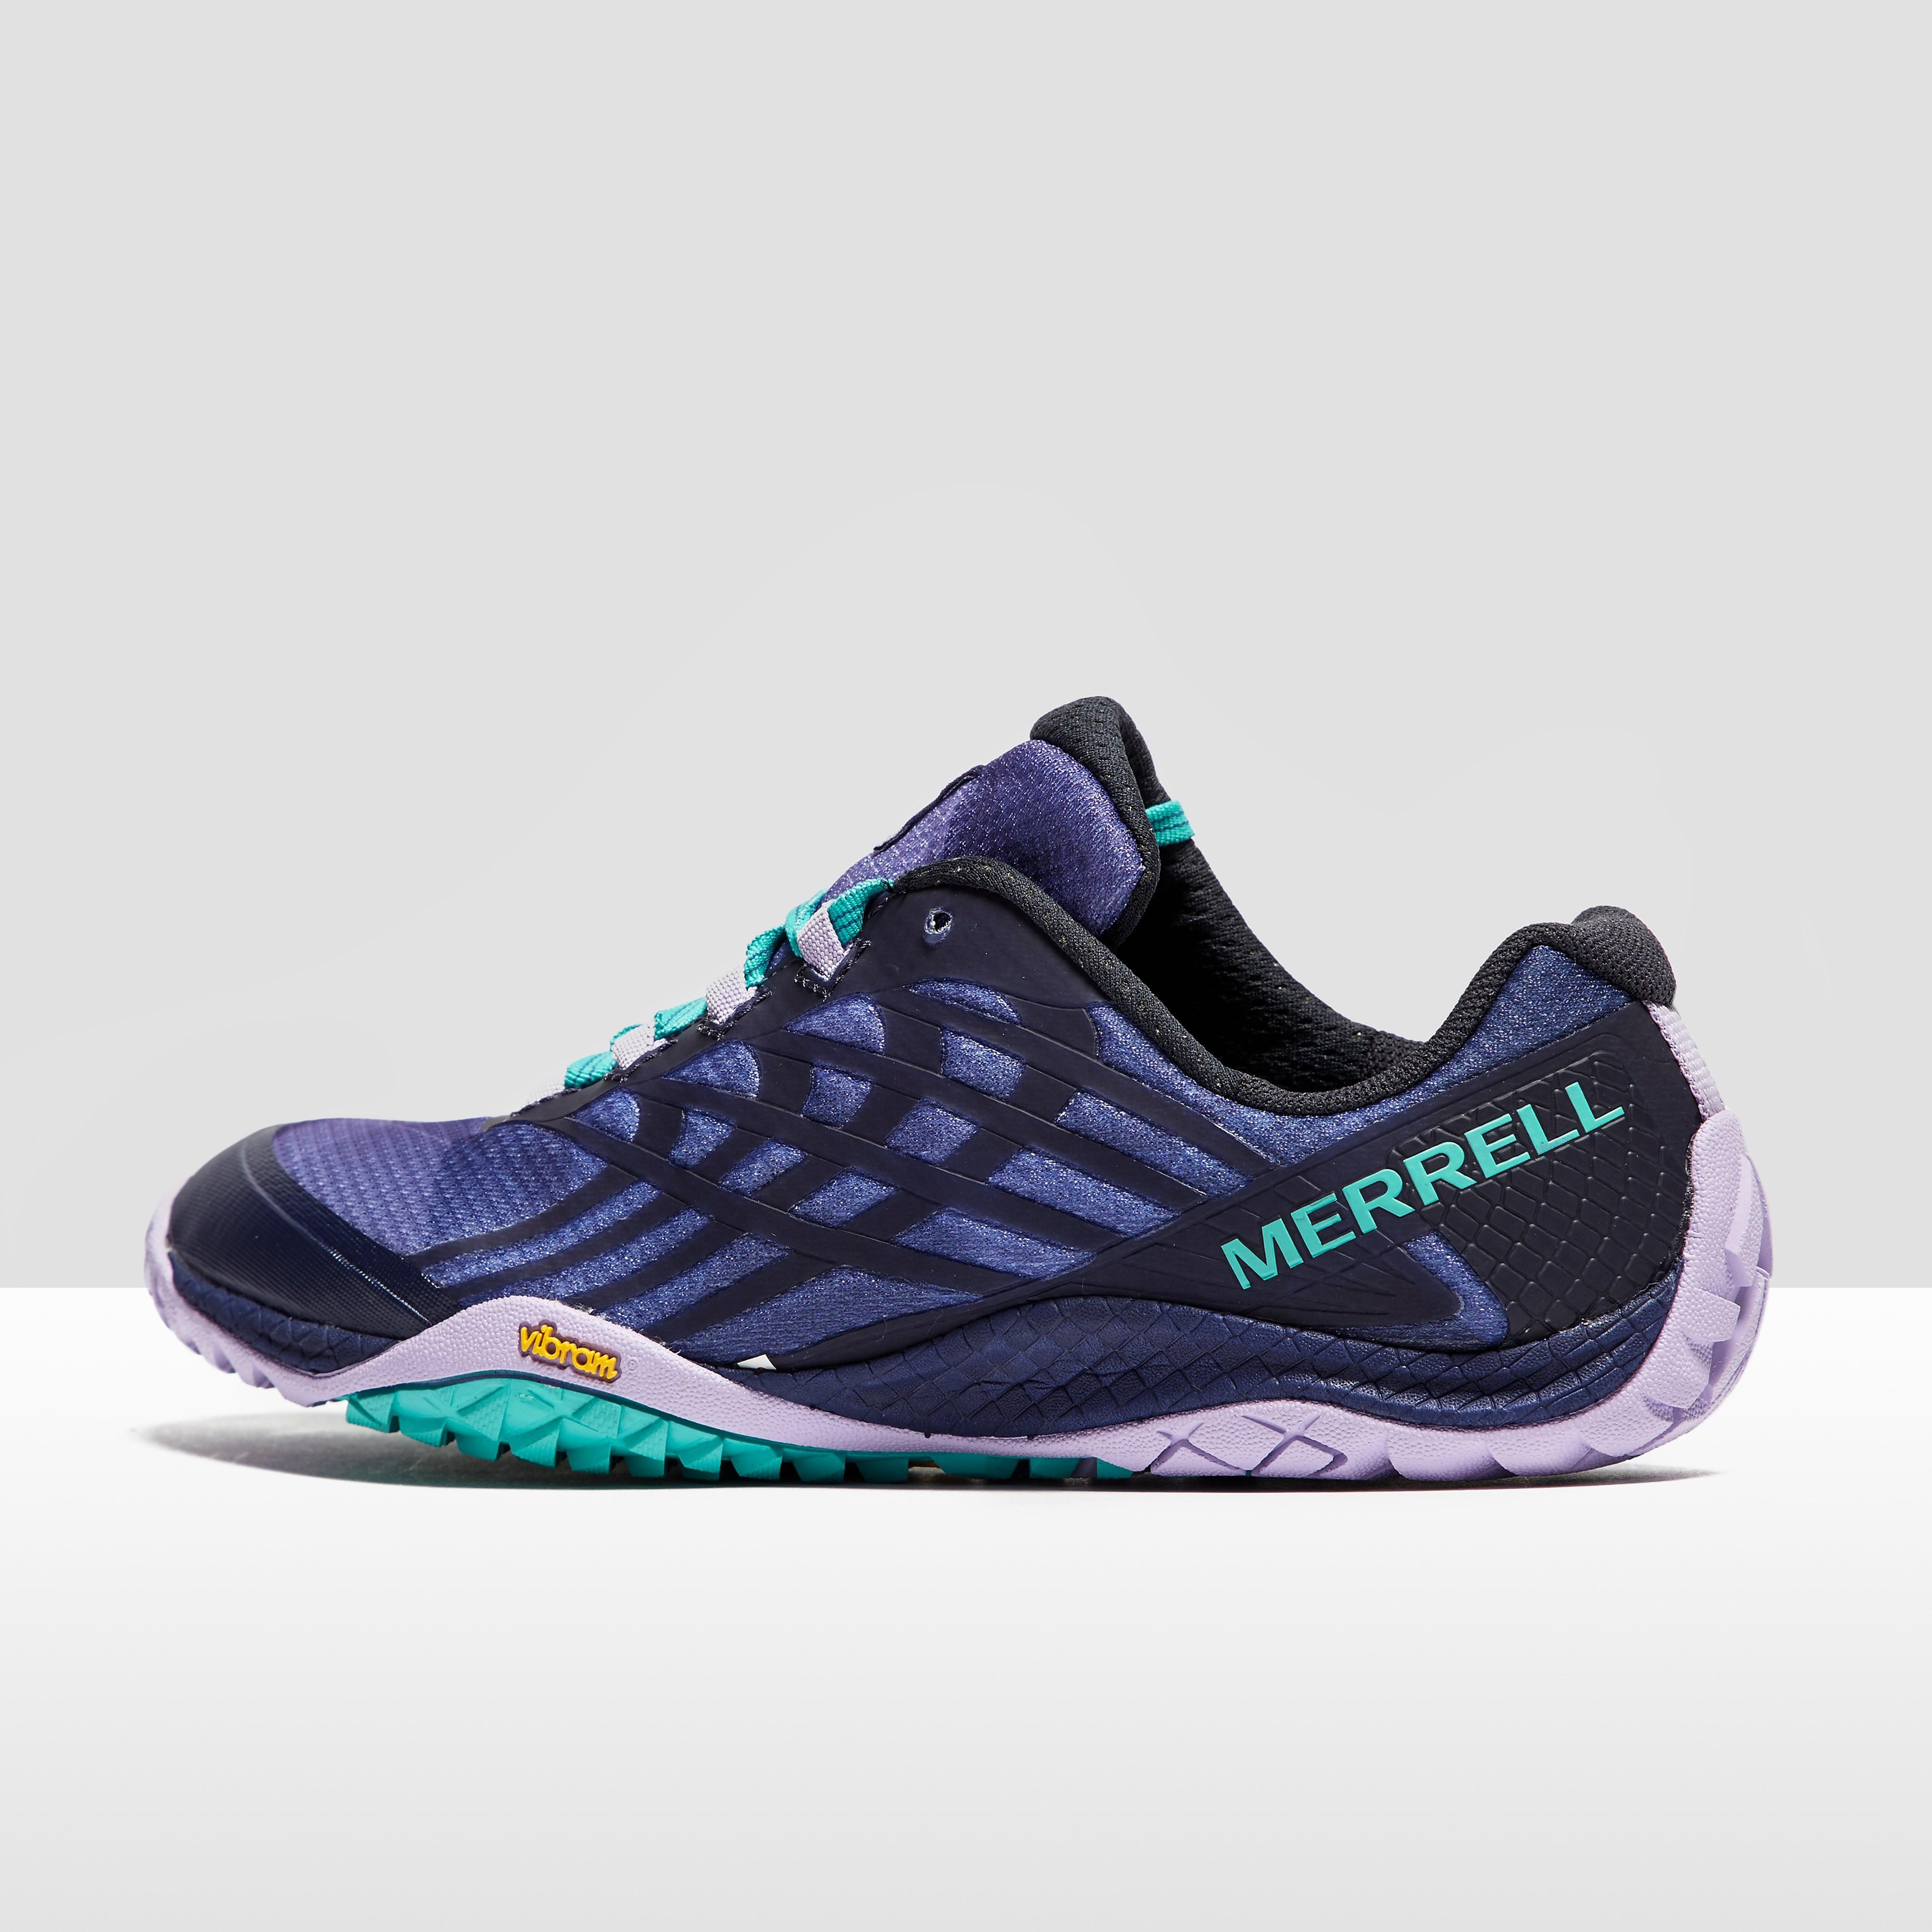 Merrell Trail Glove 4 Knit Women's Trail Shoes